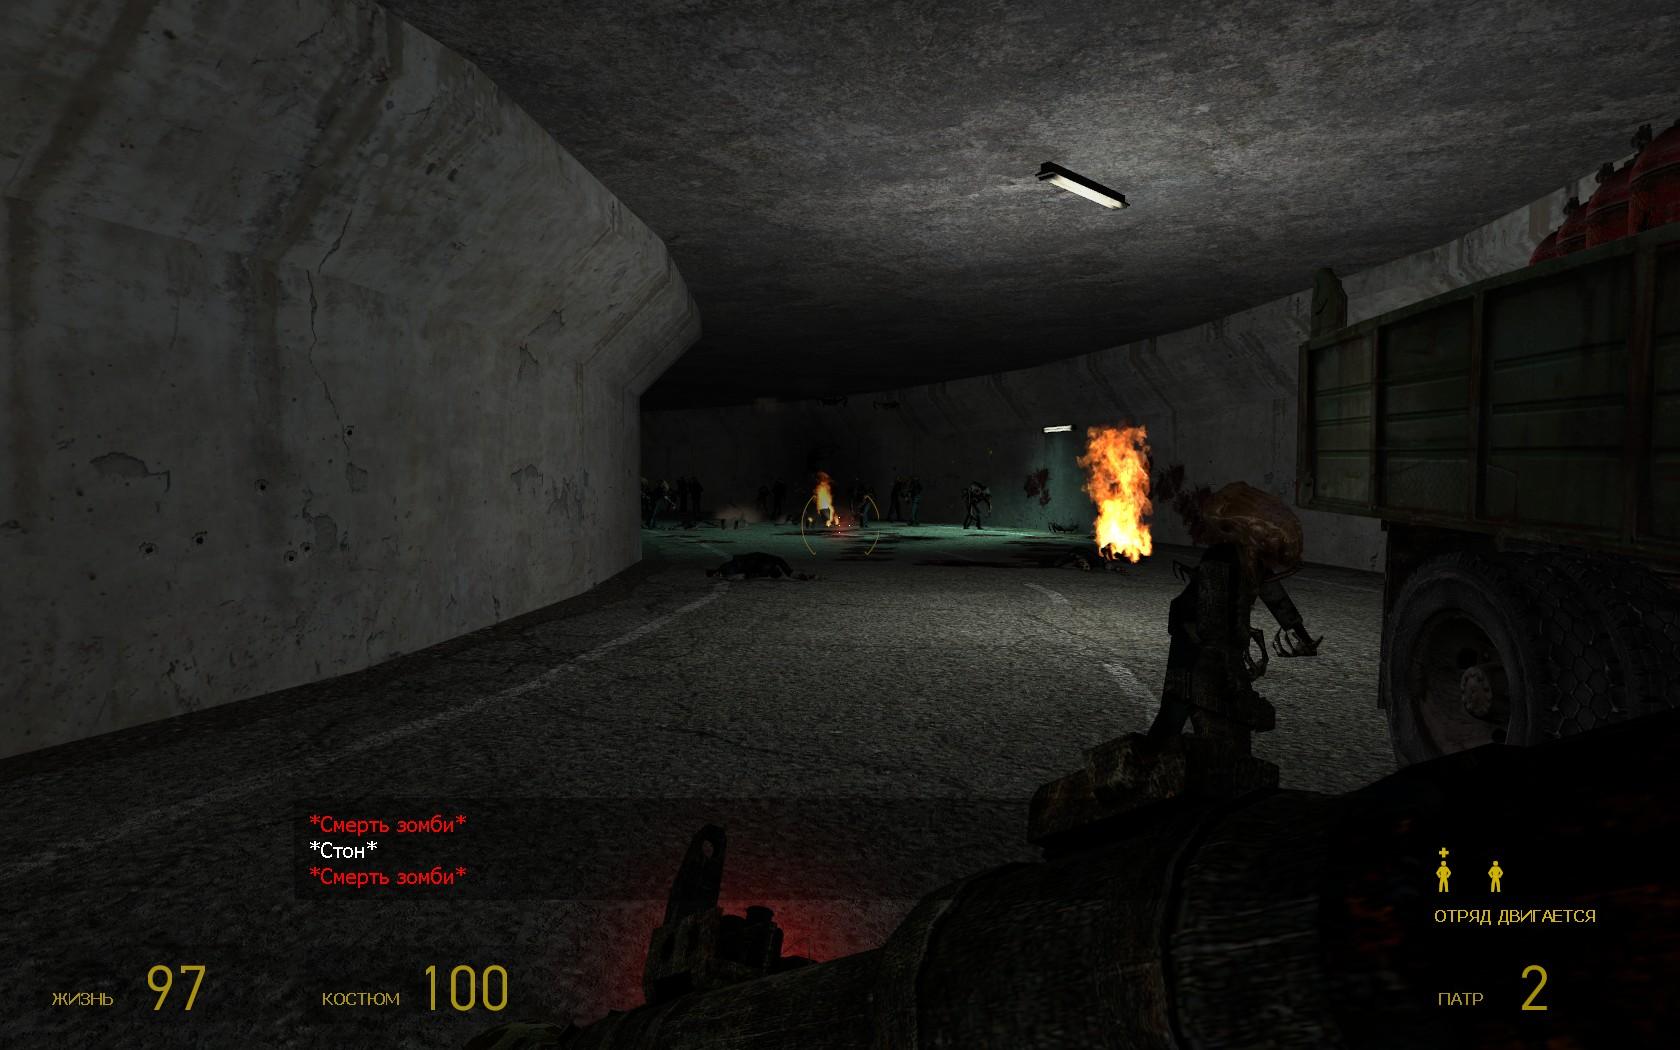 ravenholmlc40014 - Half-Life 2 ravenholmlc40014